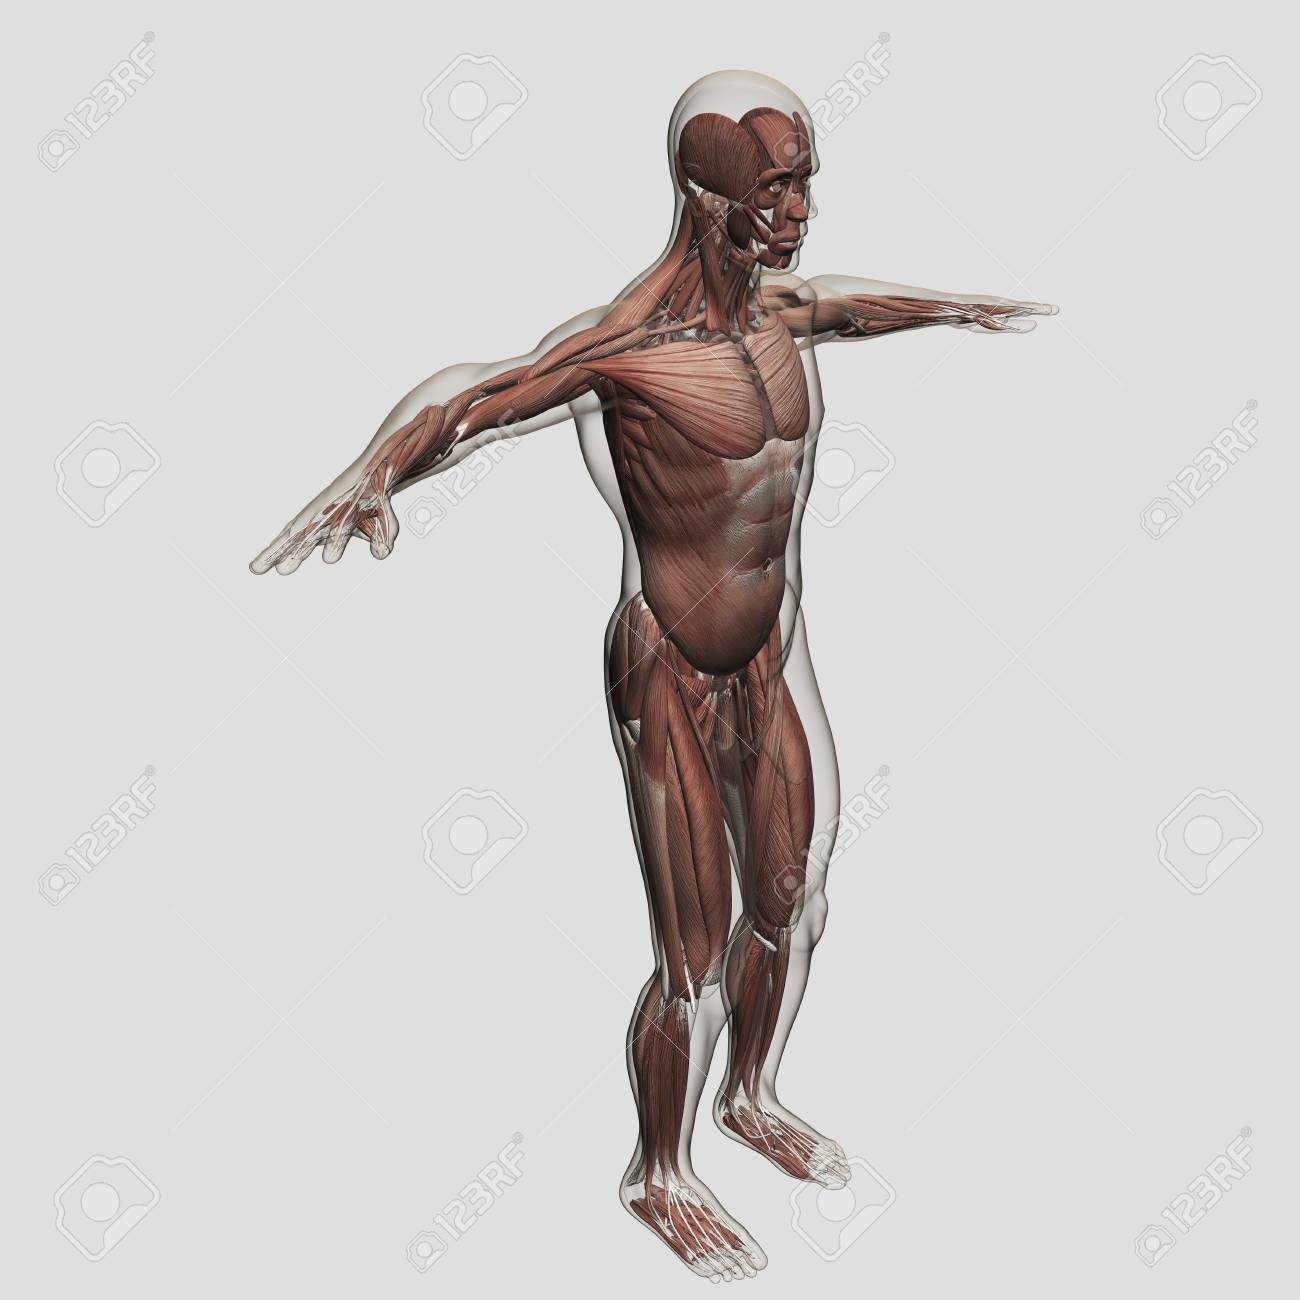 Anatomía Del Sistema Muscular Masculino, Vista Lateral. Fotos ...